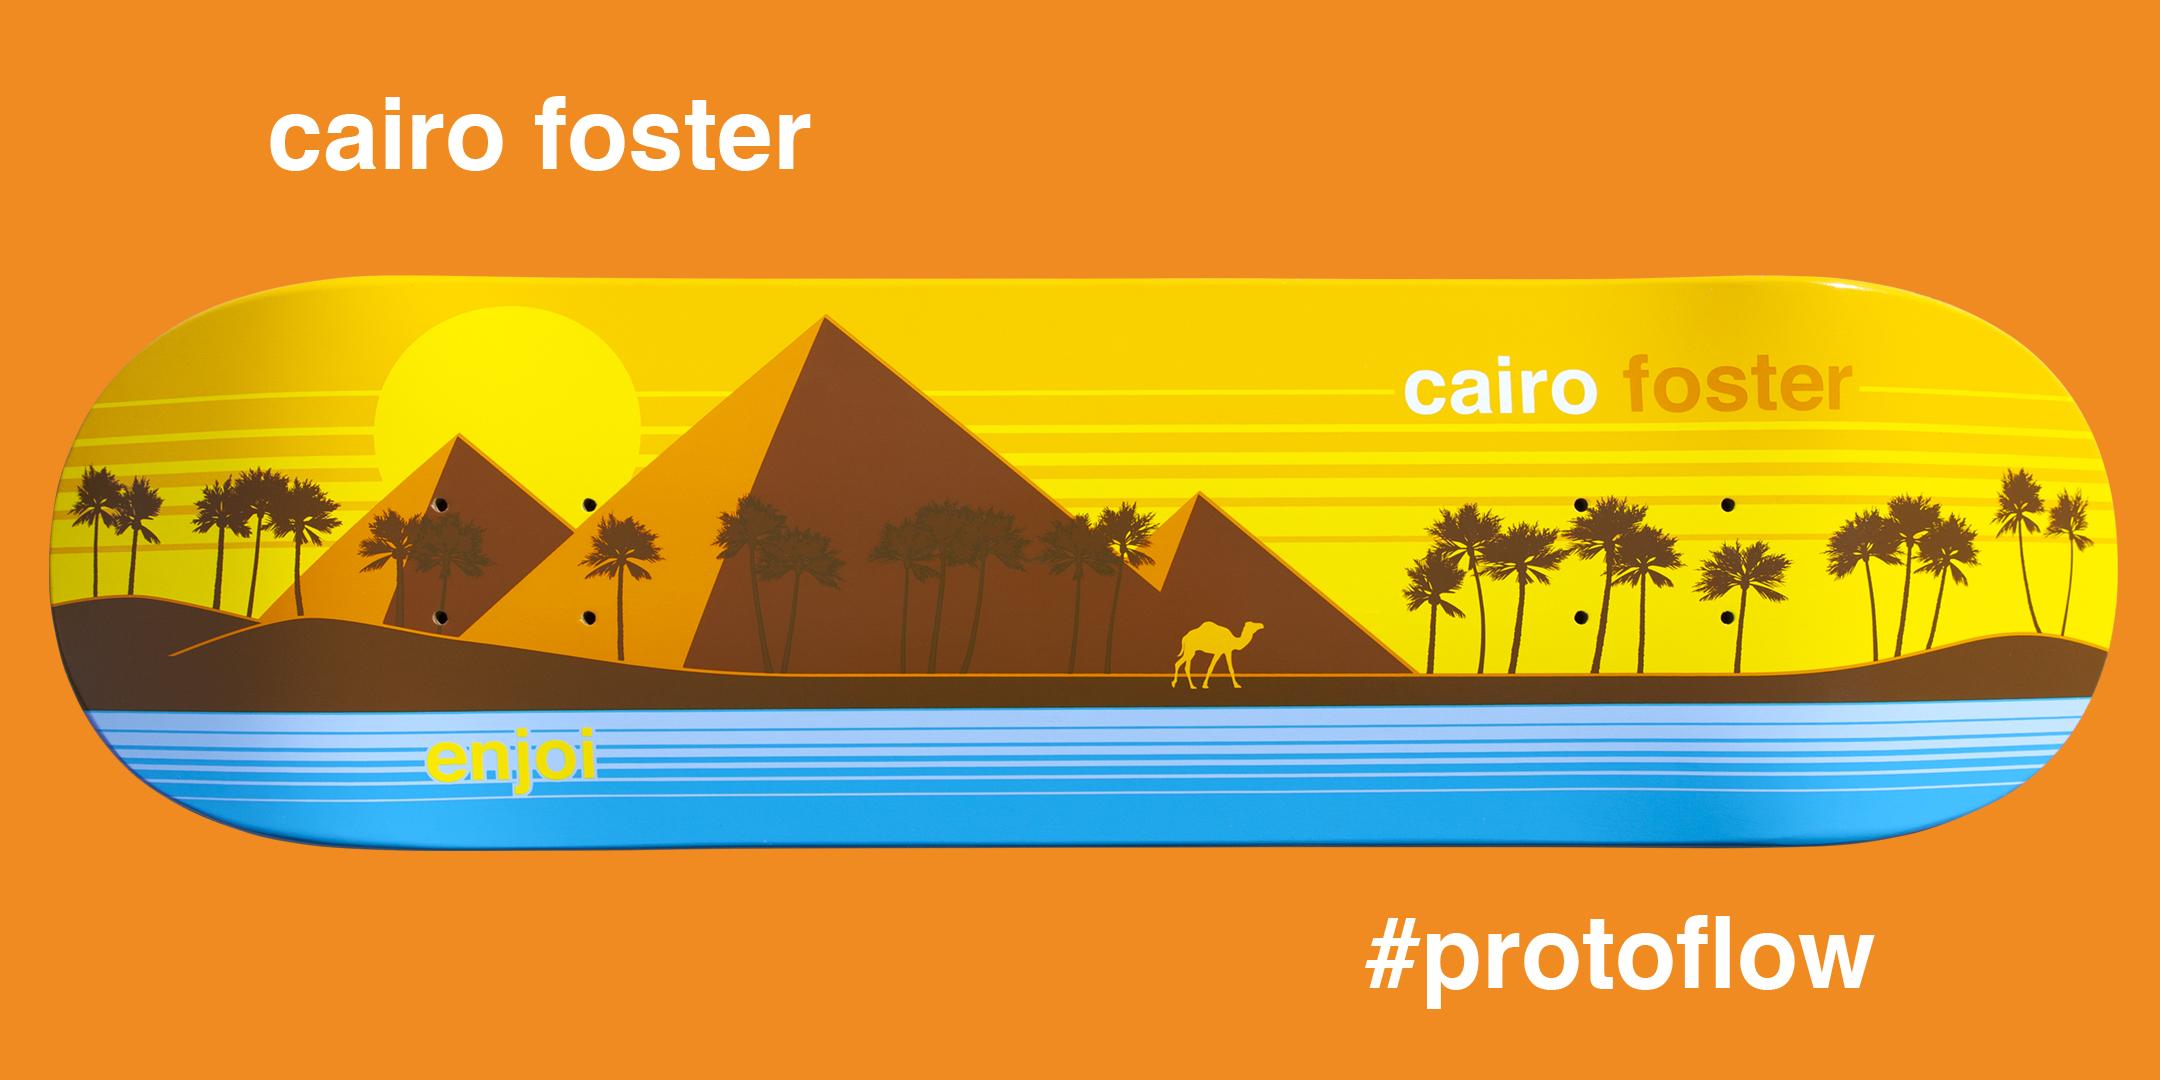 cairo's last pro board for enjoi #protoflow